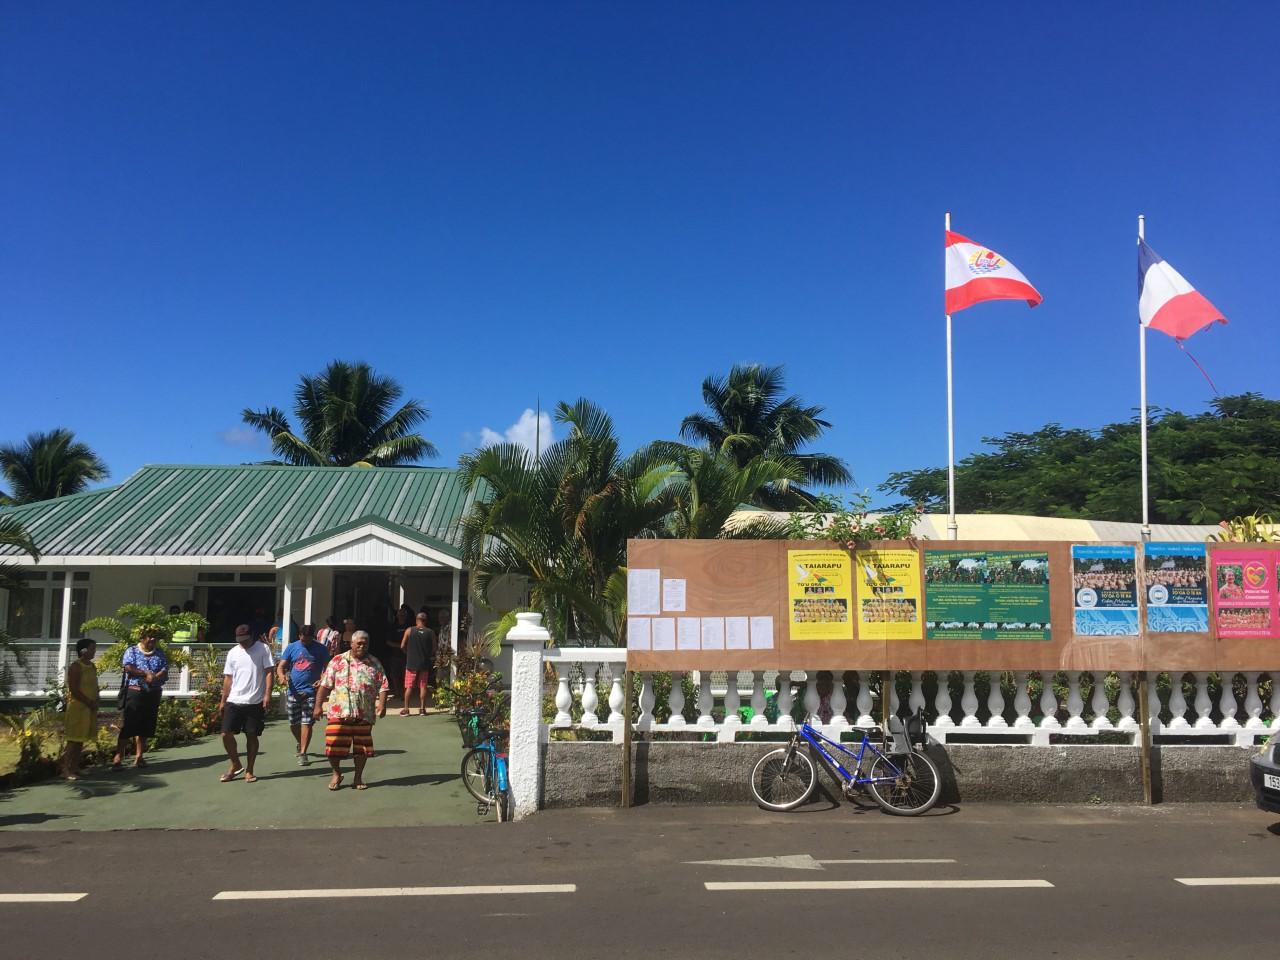 Hamblin plébiscité à Taiarapu-Ouest